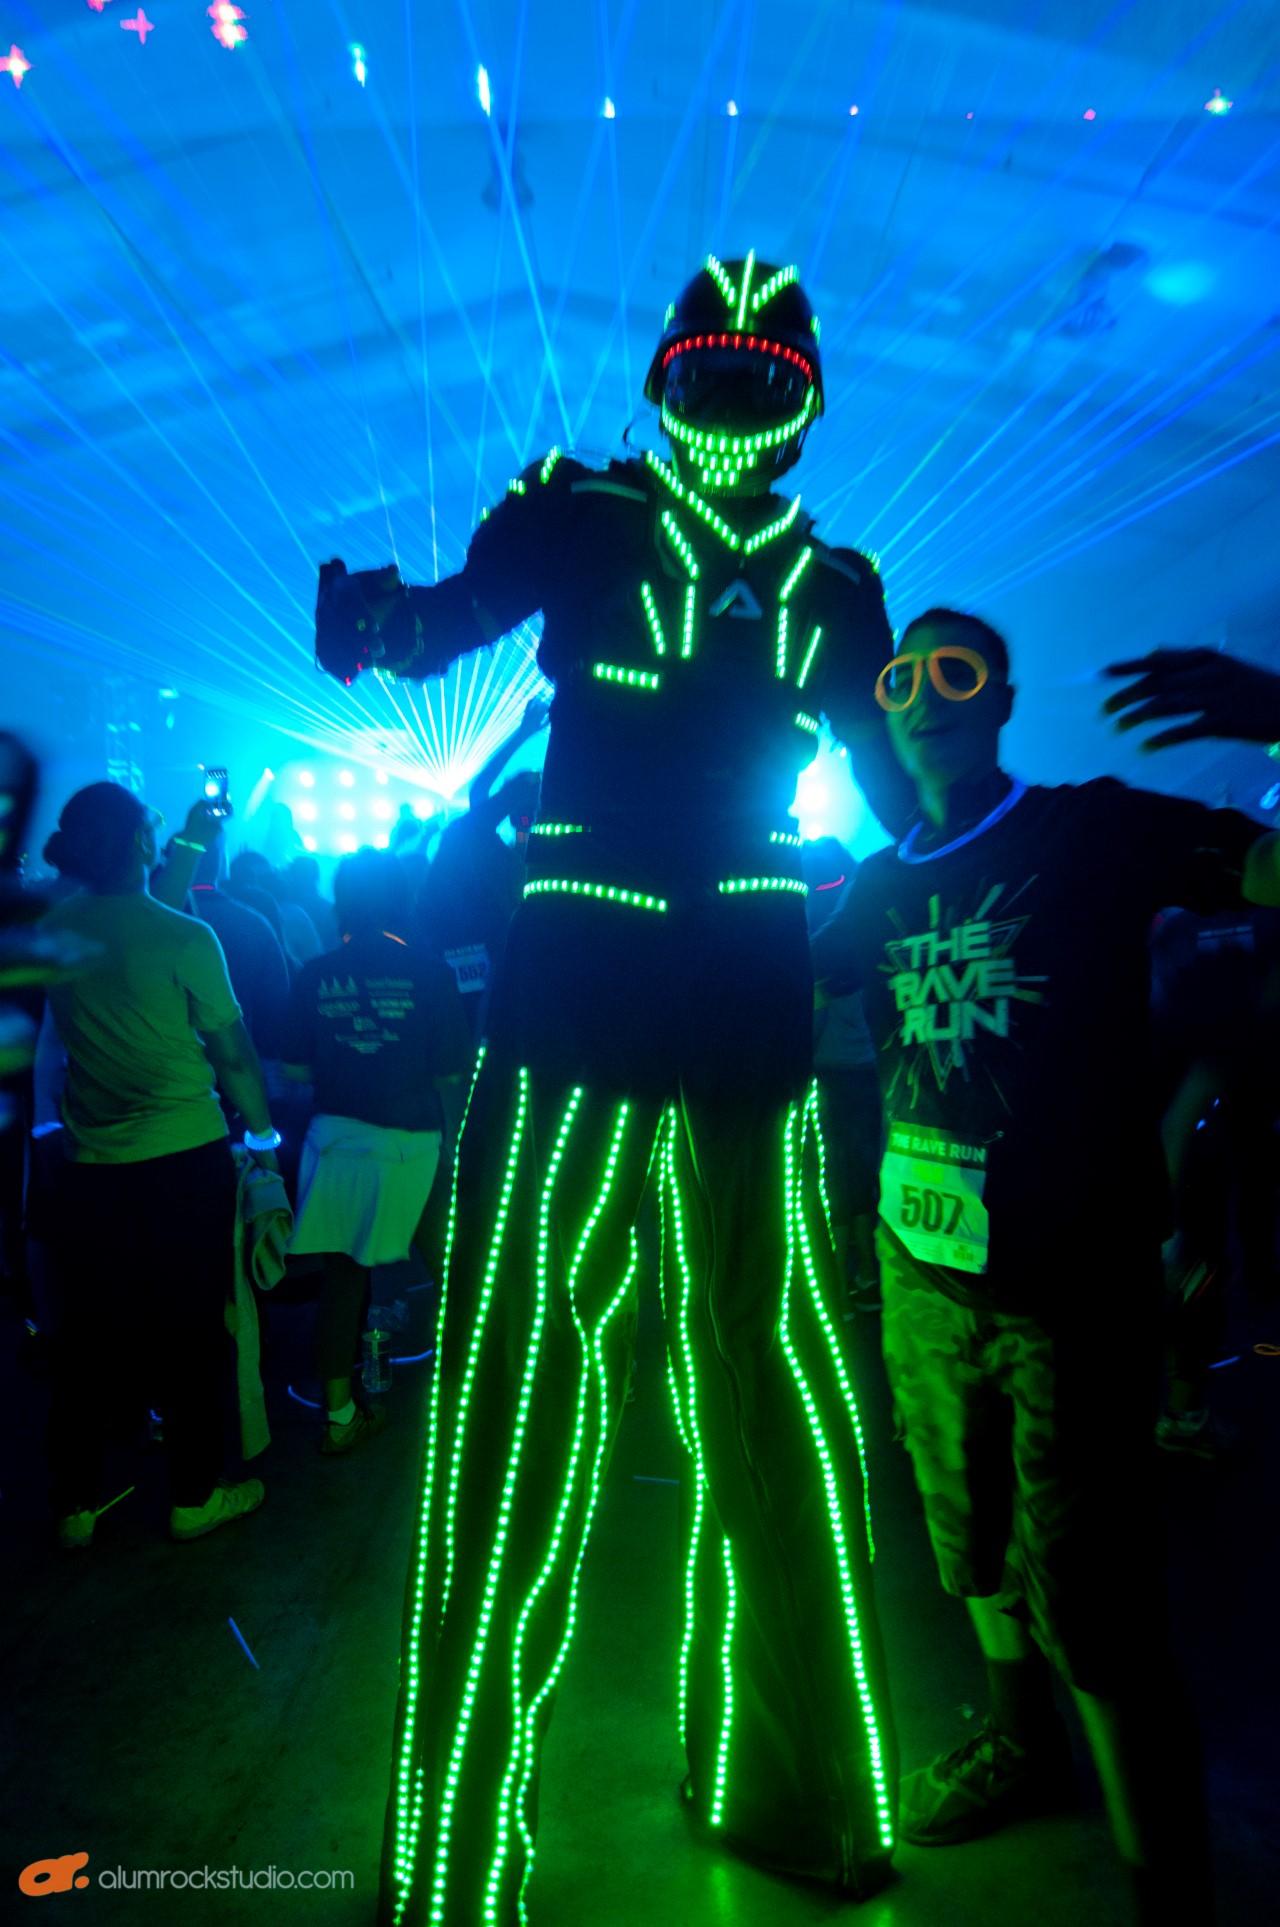 The Rave Run 2013 -San Jose